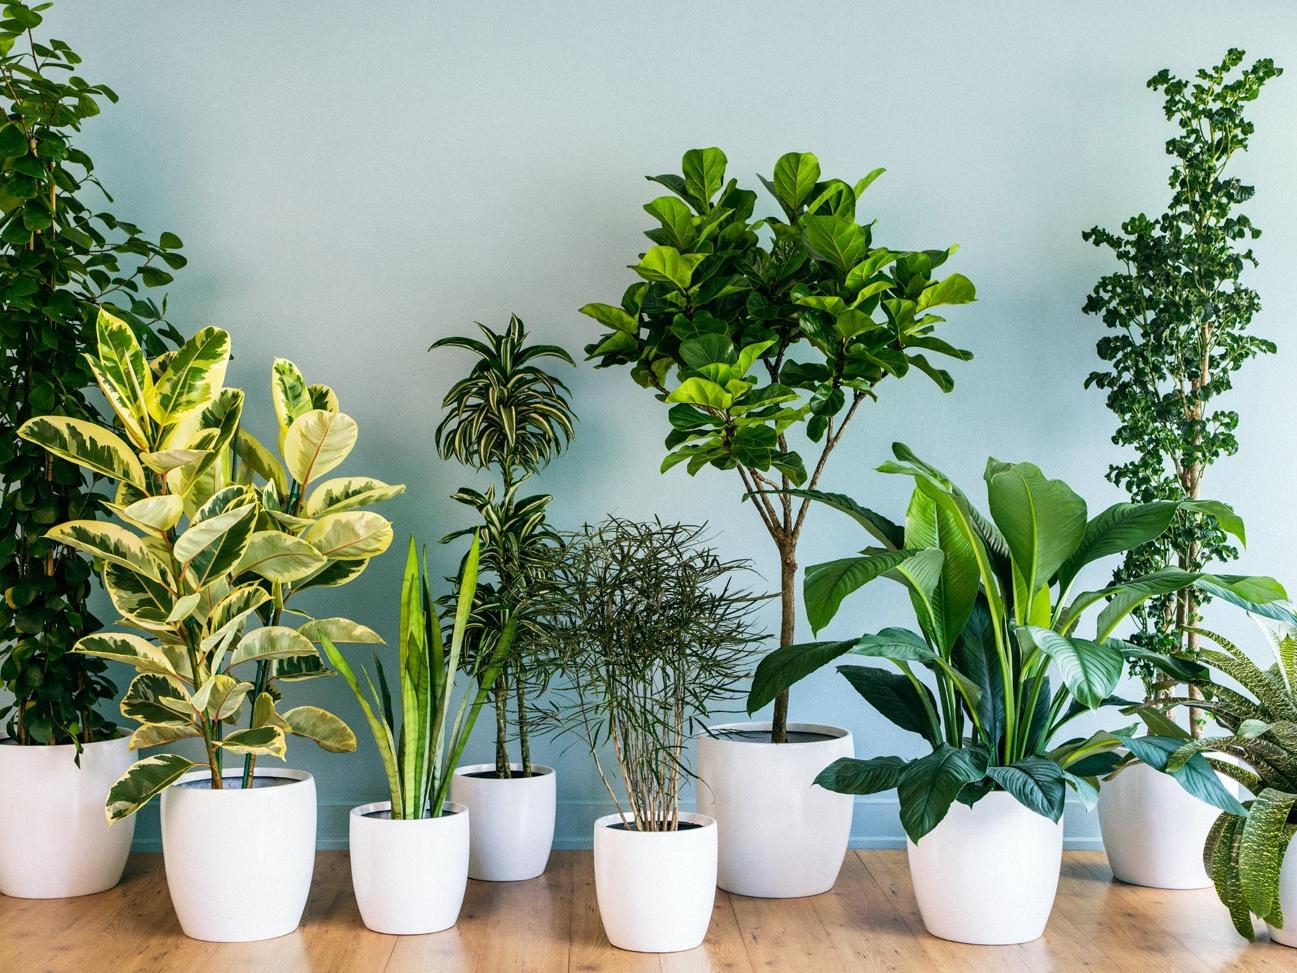 house-plants-decor-grouping-0213.jpg